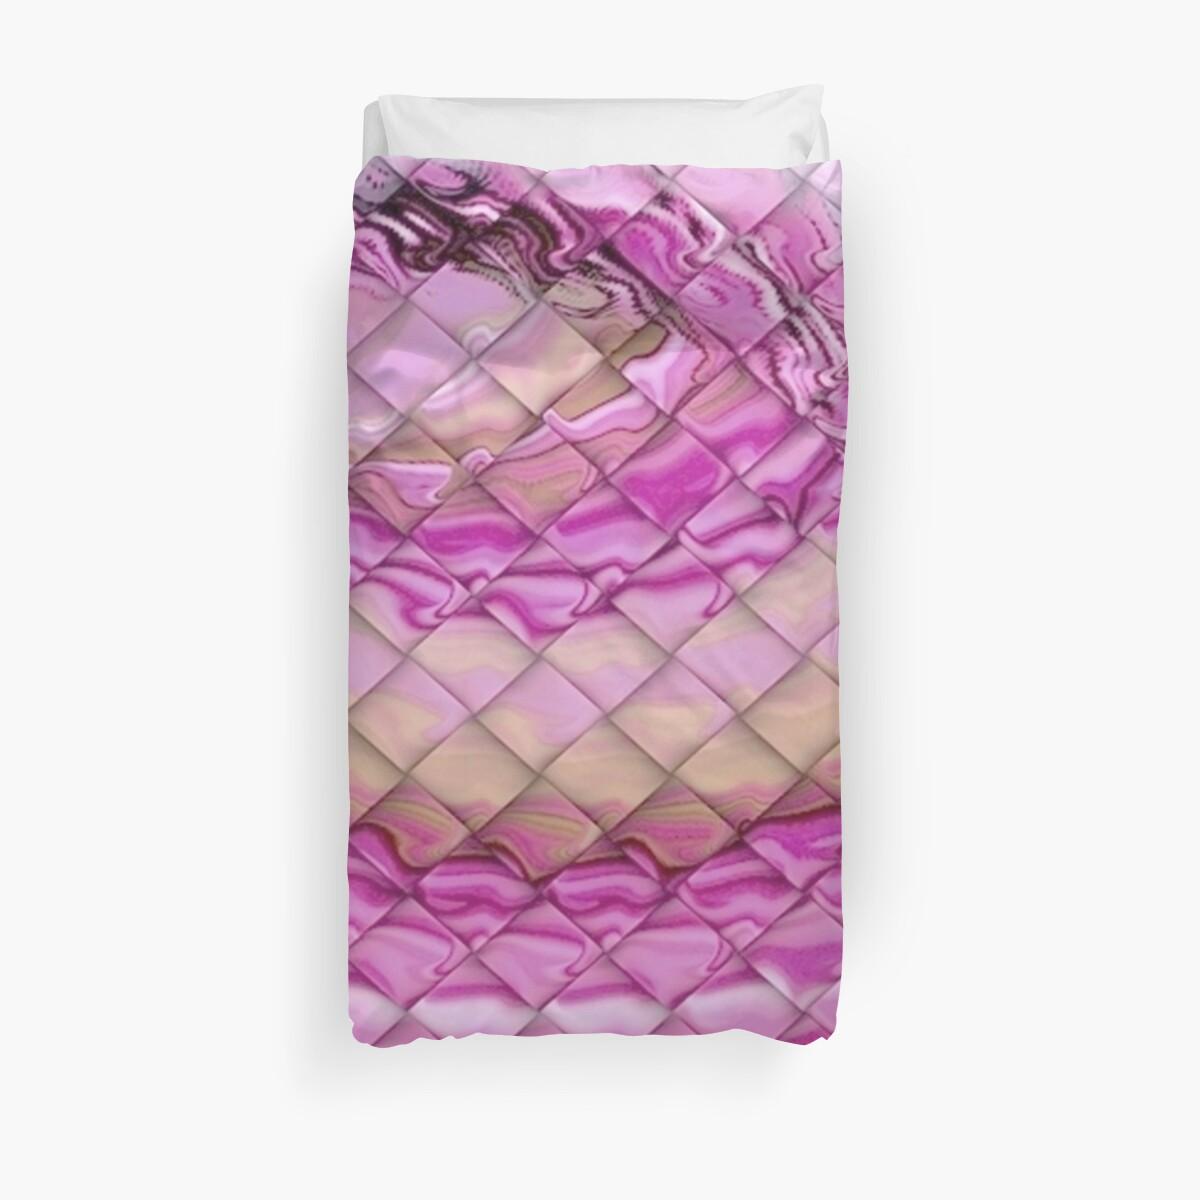 Braided Silk by Greta  McLaughlin